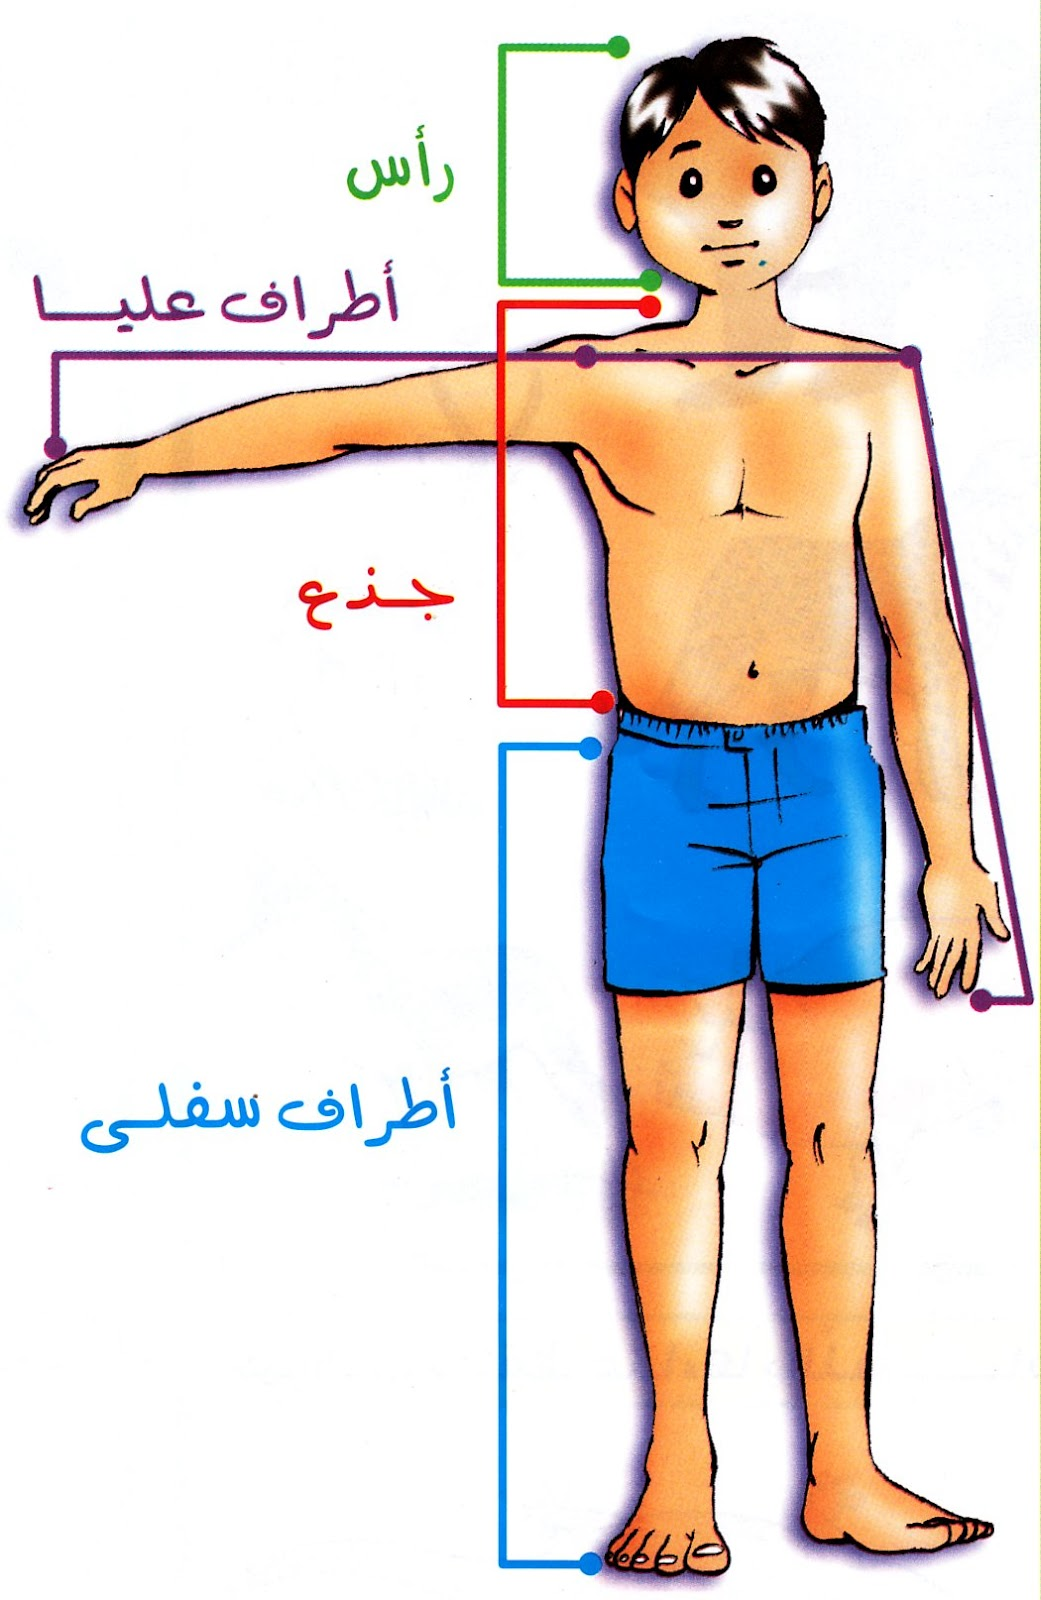 بالصور جسم الانسان بالصور , اكتشف ما في داخل جسمك بالصور 1291 4